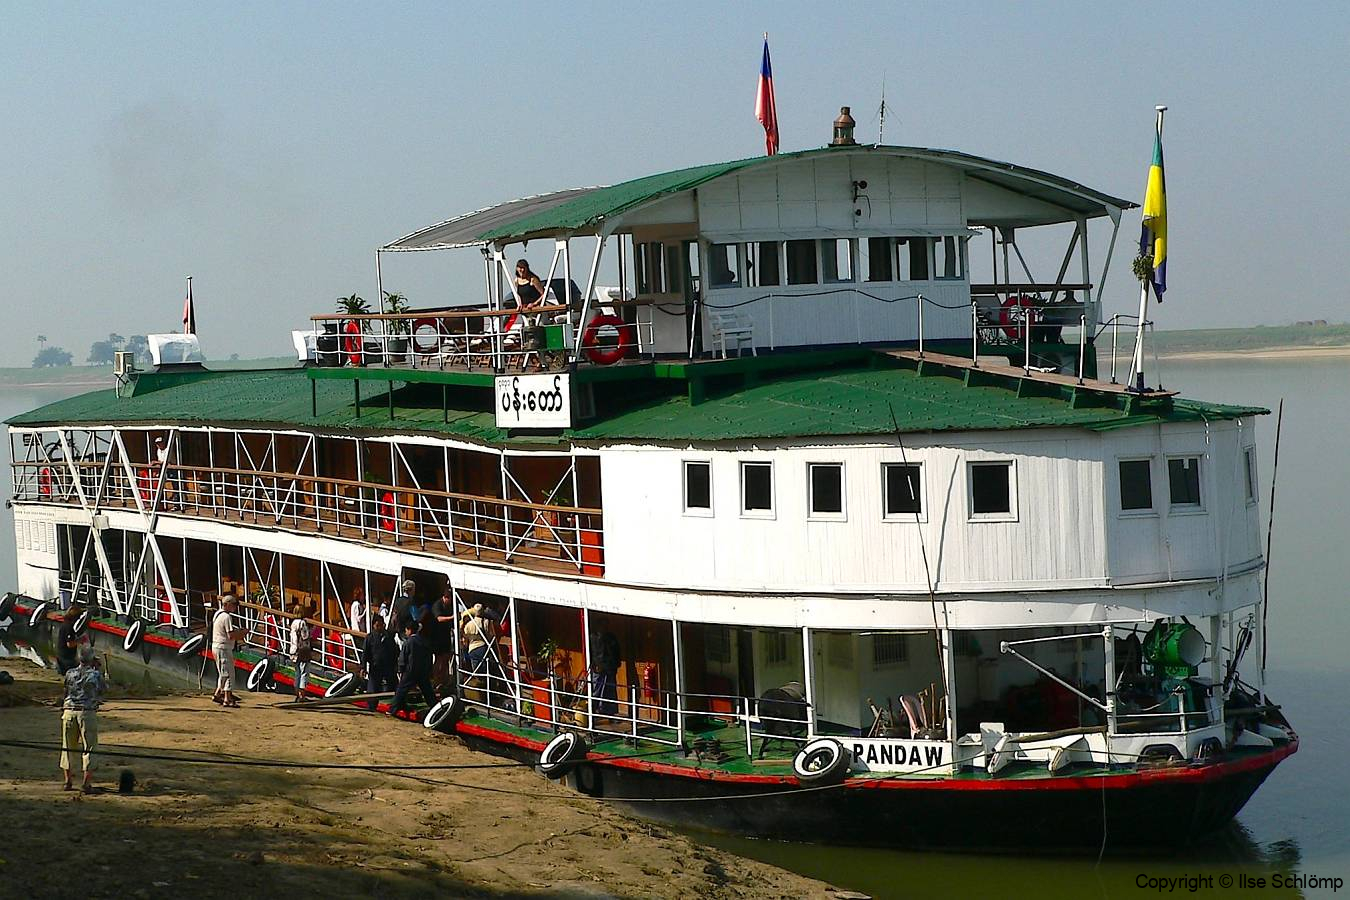 Myanmar, Irrawaddy, Pandaw